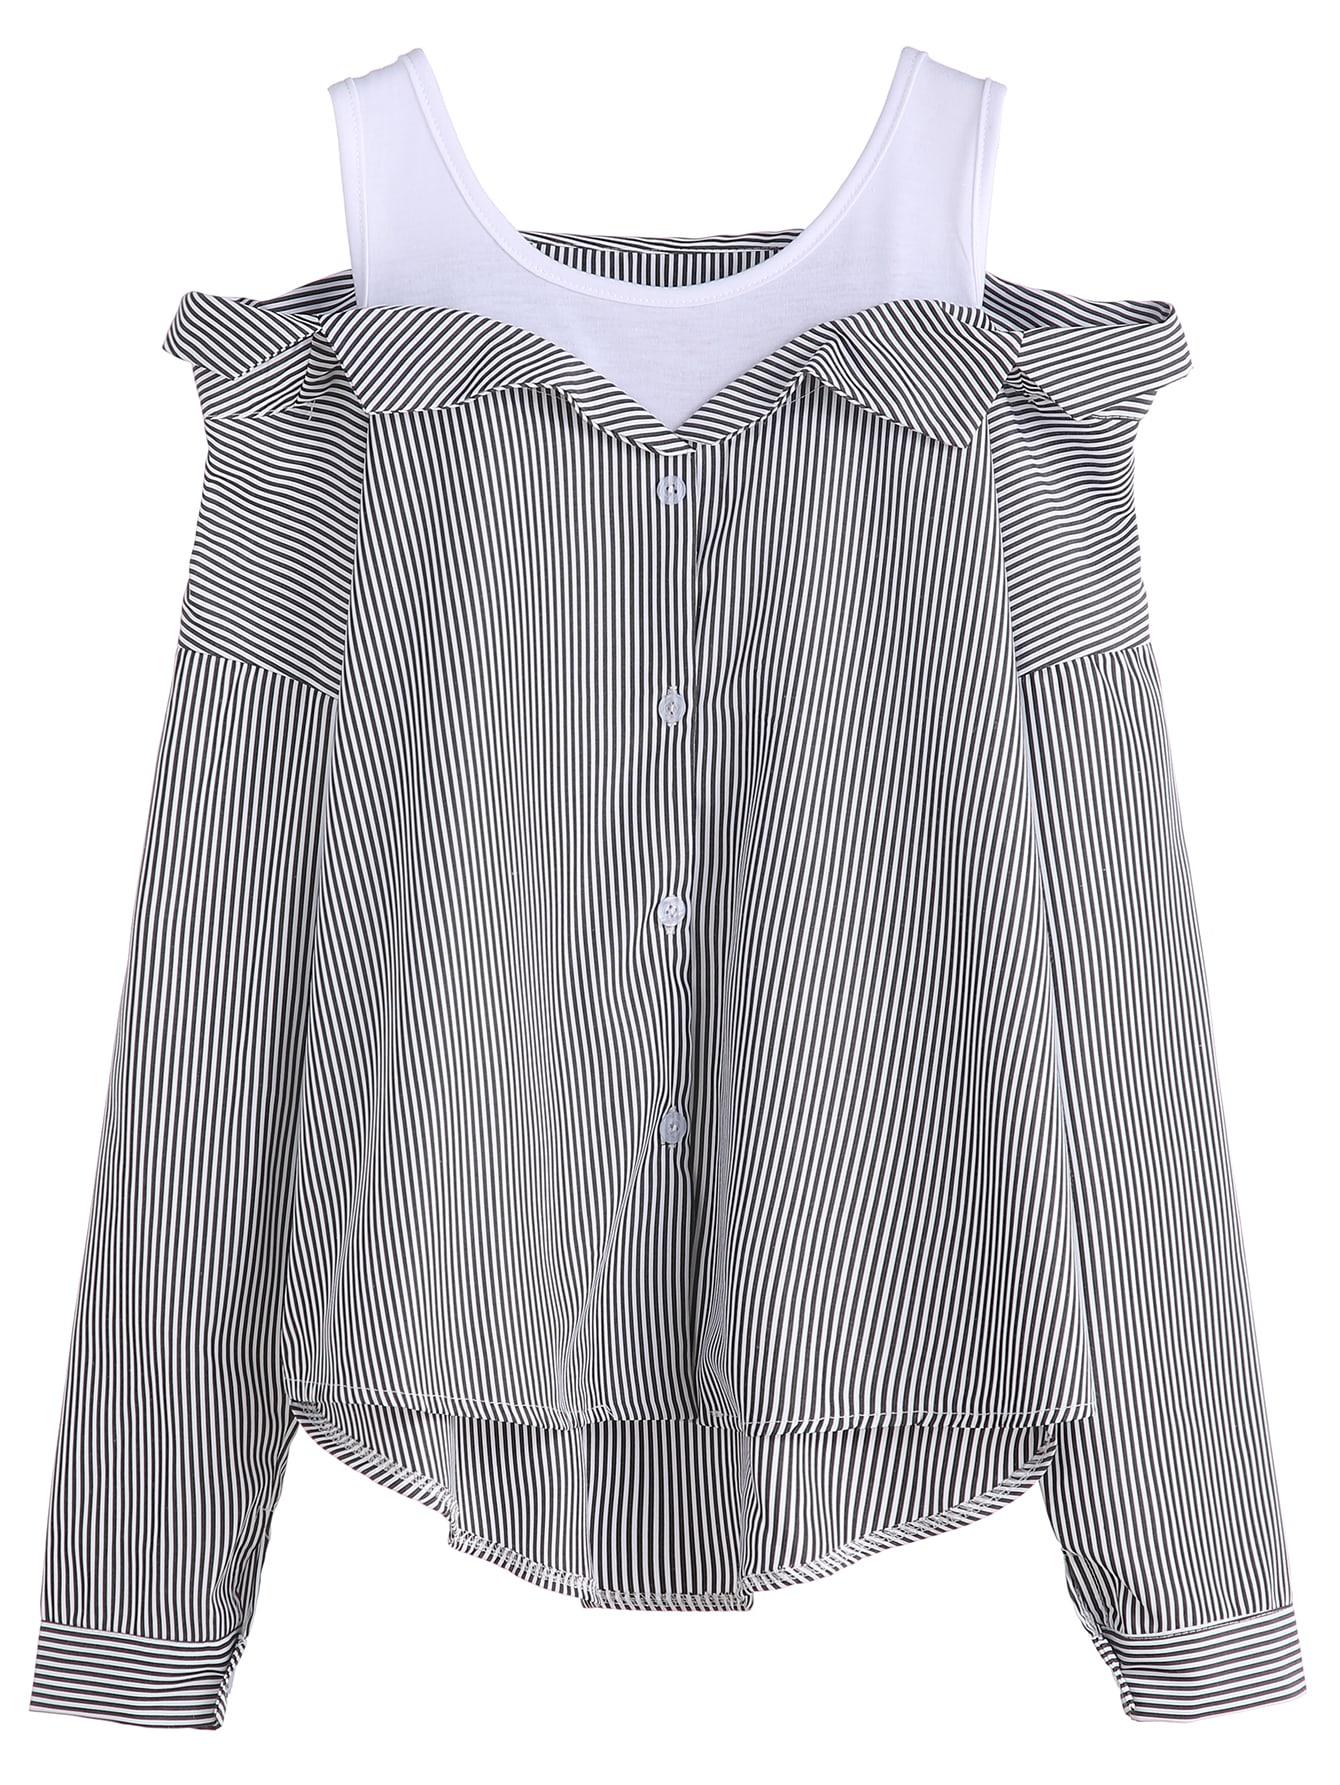 blouse160830123_2